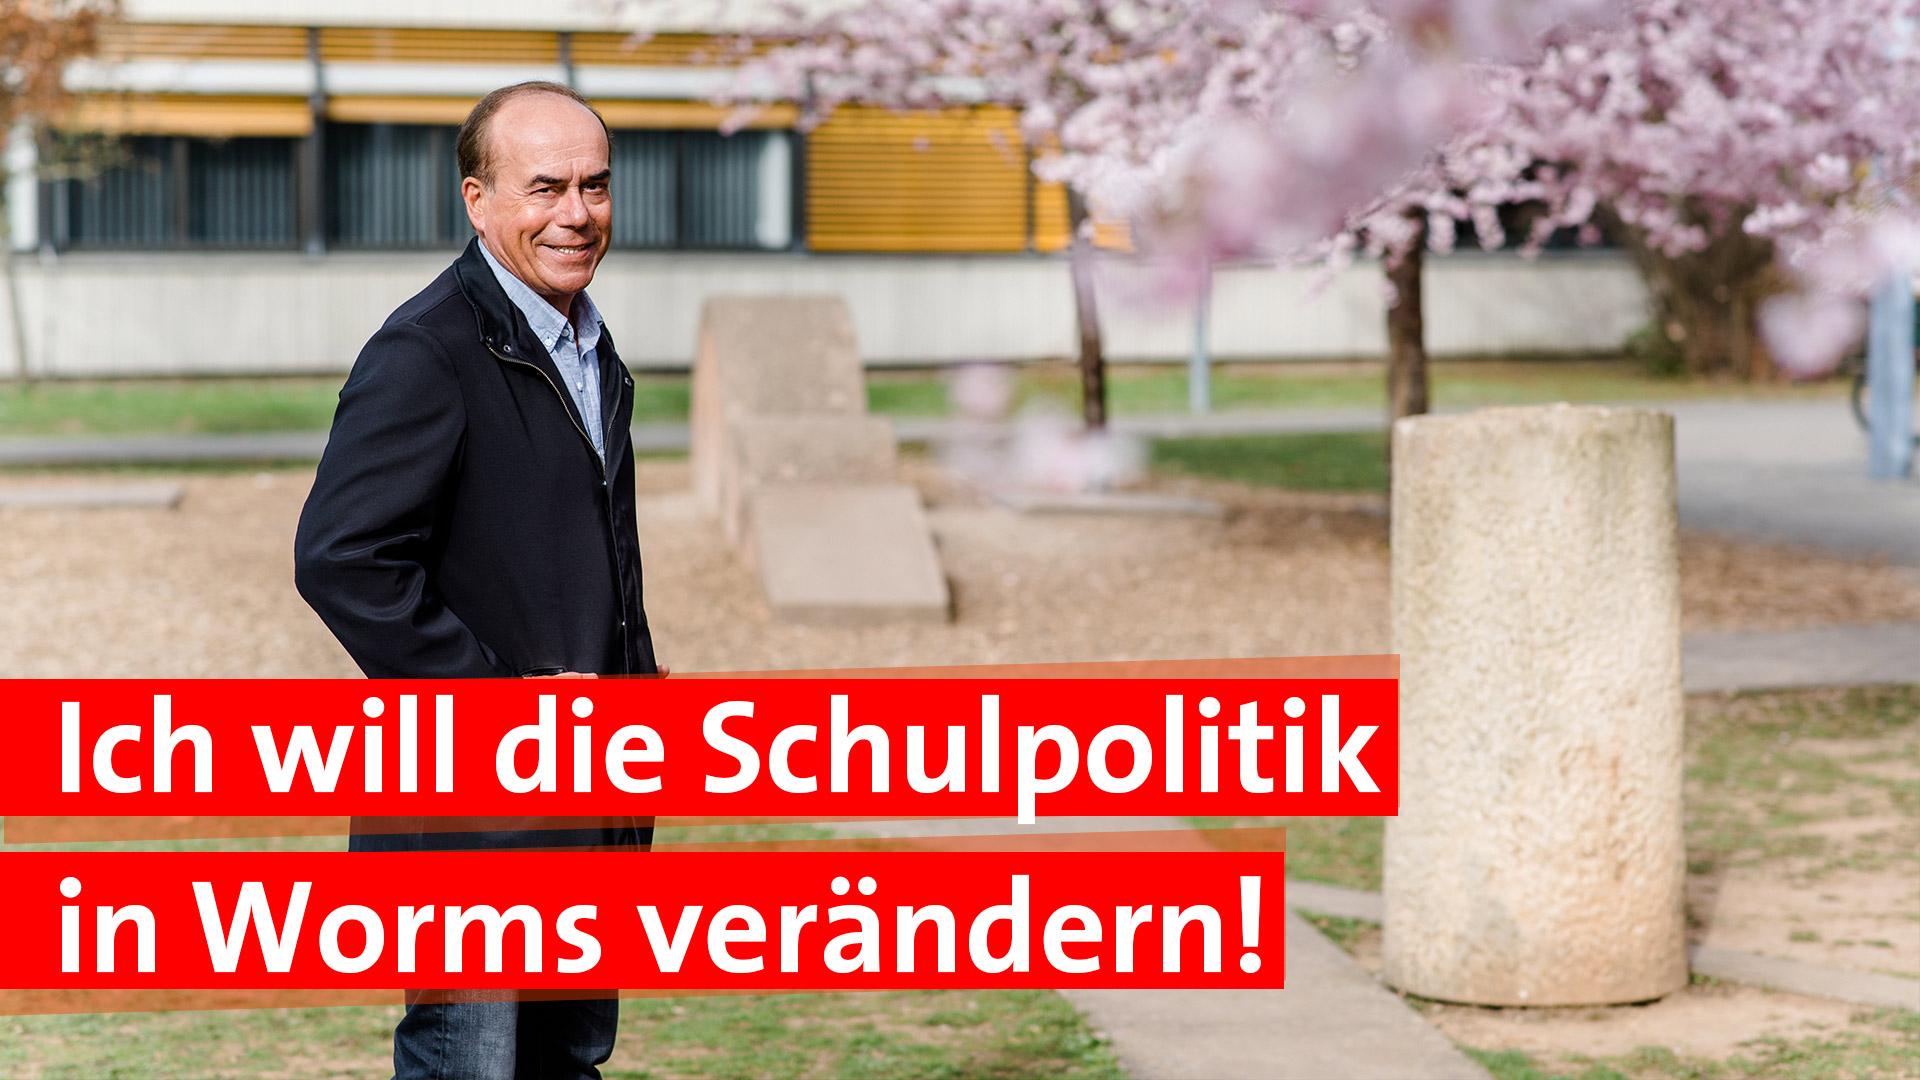 Schulpolitik in Worms verändern Ralf Lottermann